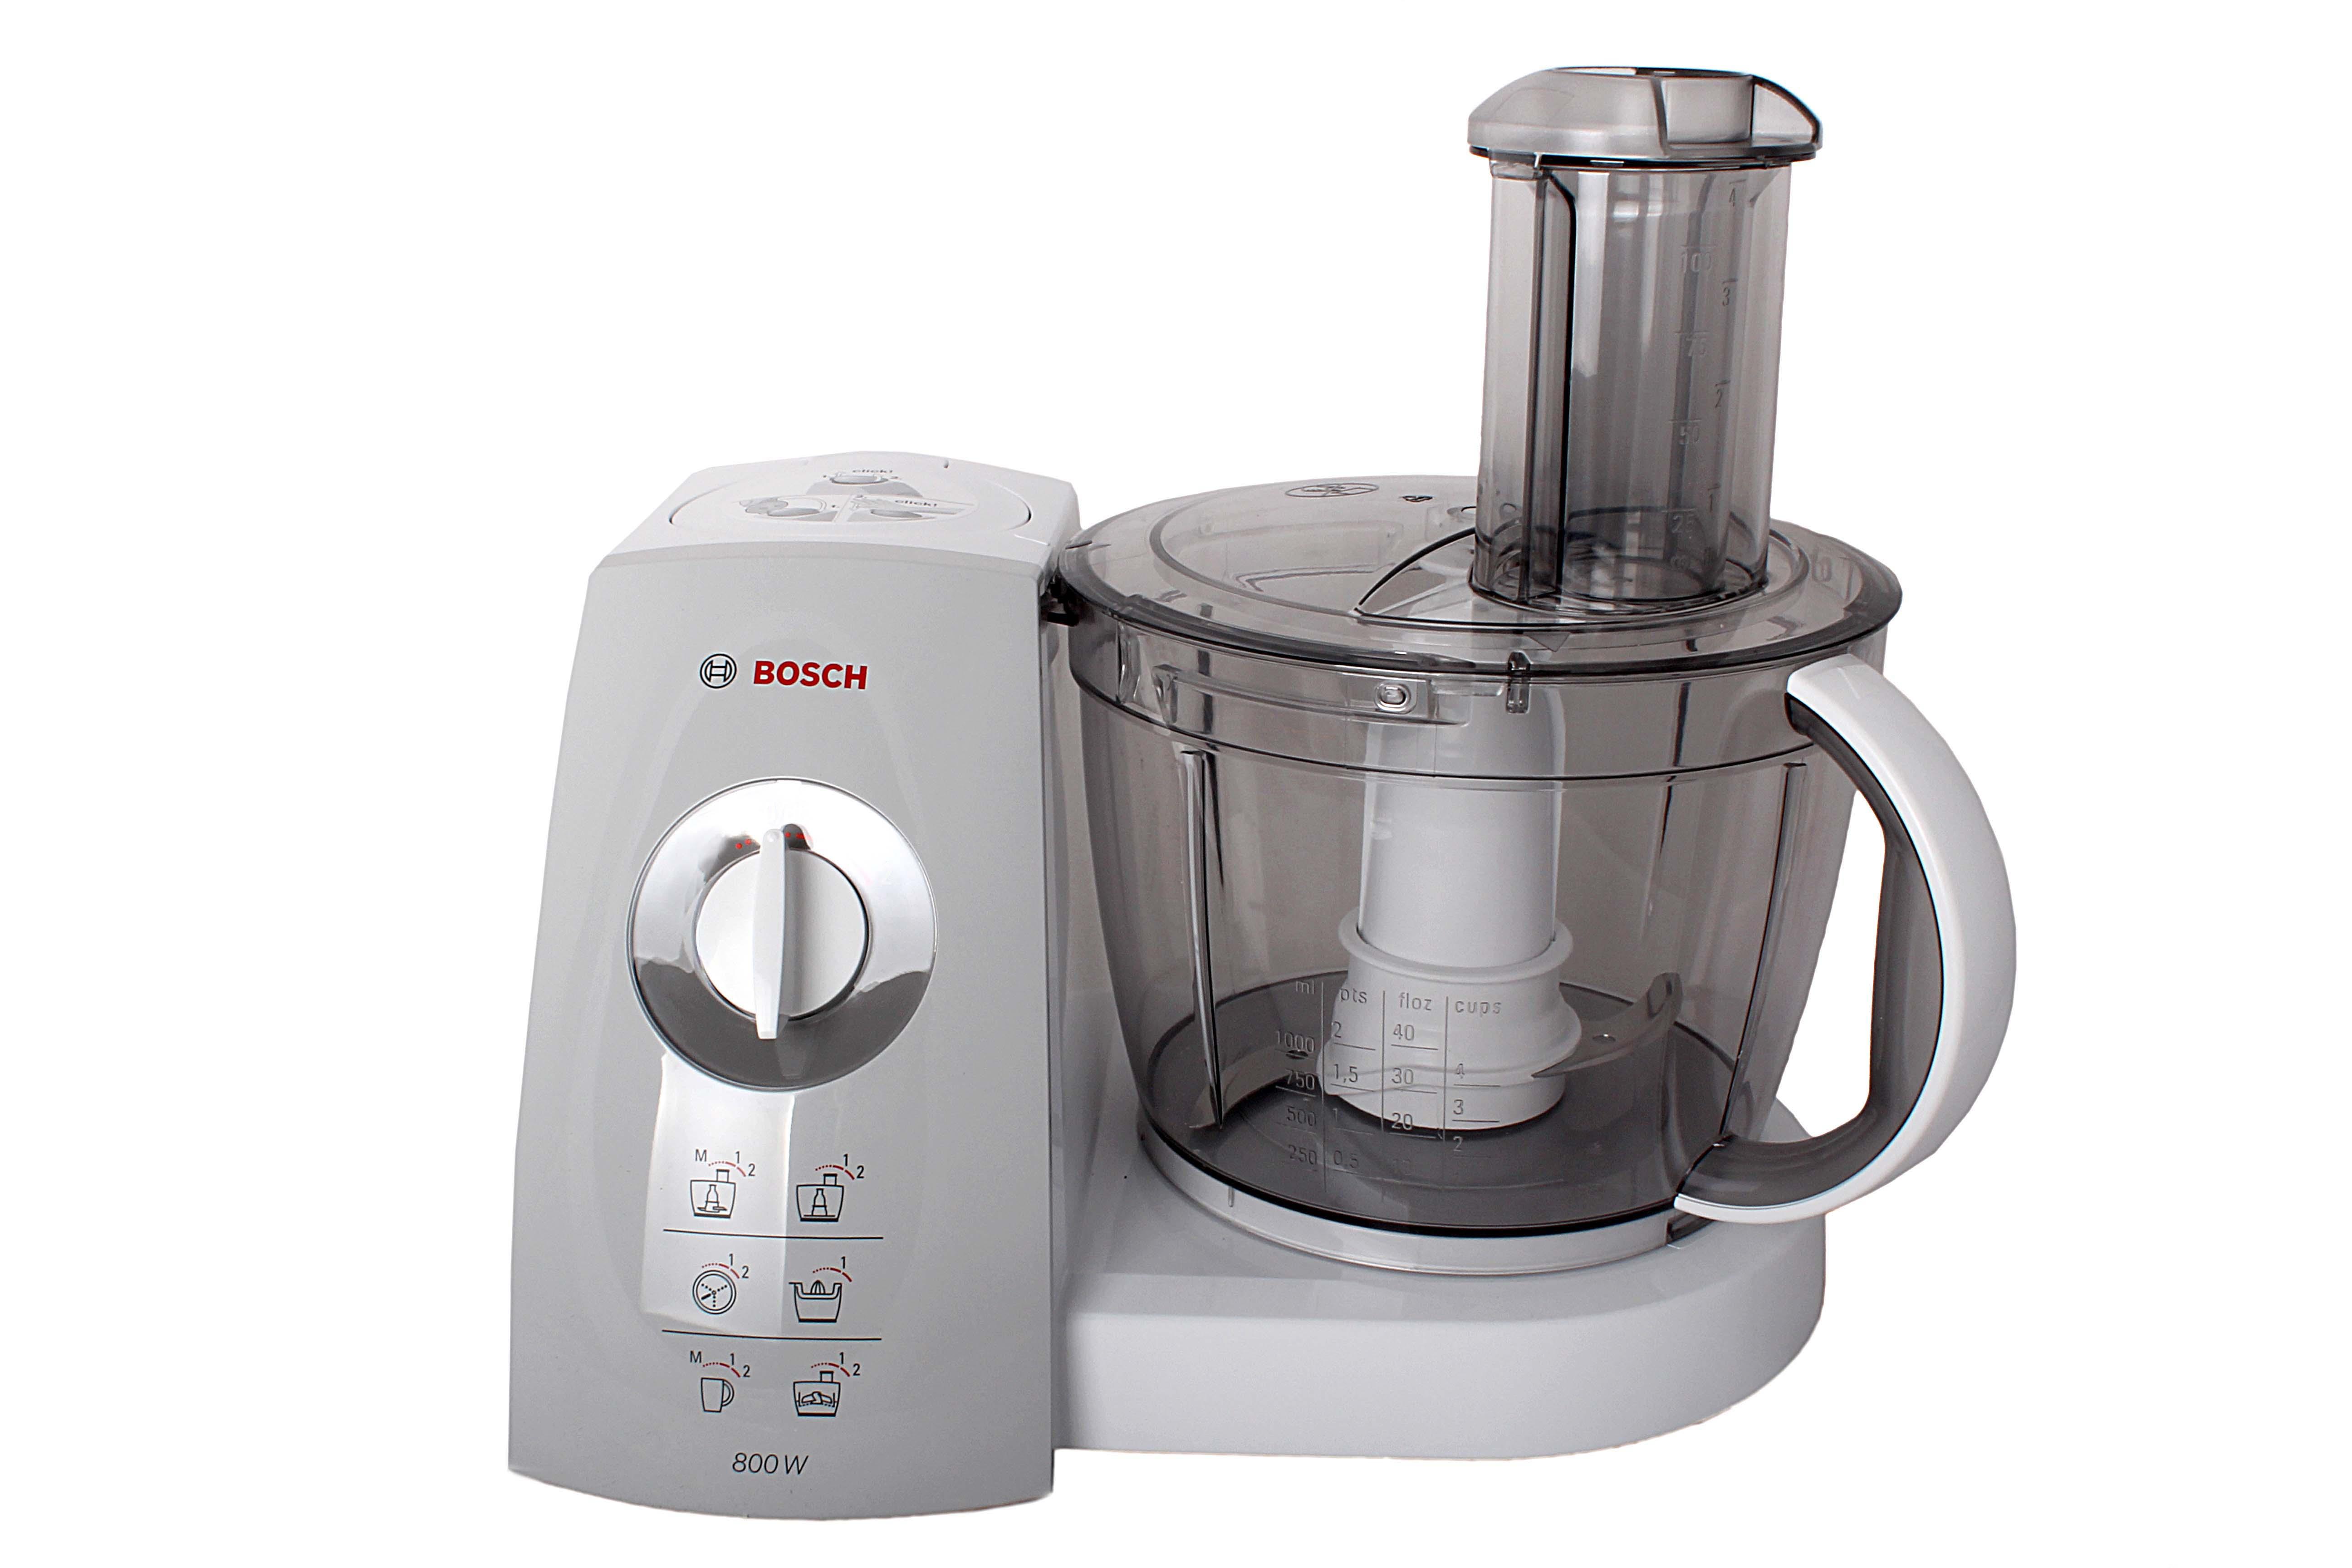 Кухонный комбайн Bosch Real Brand Technics 4850.000